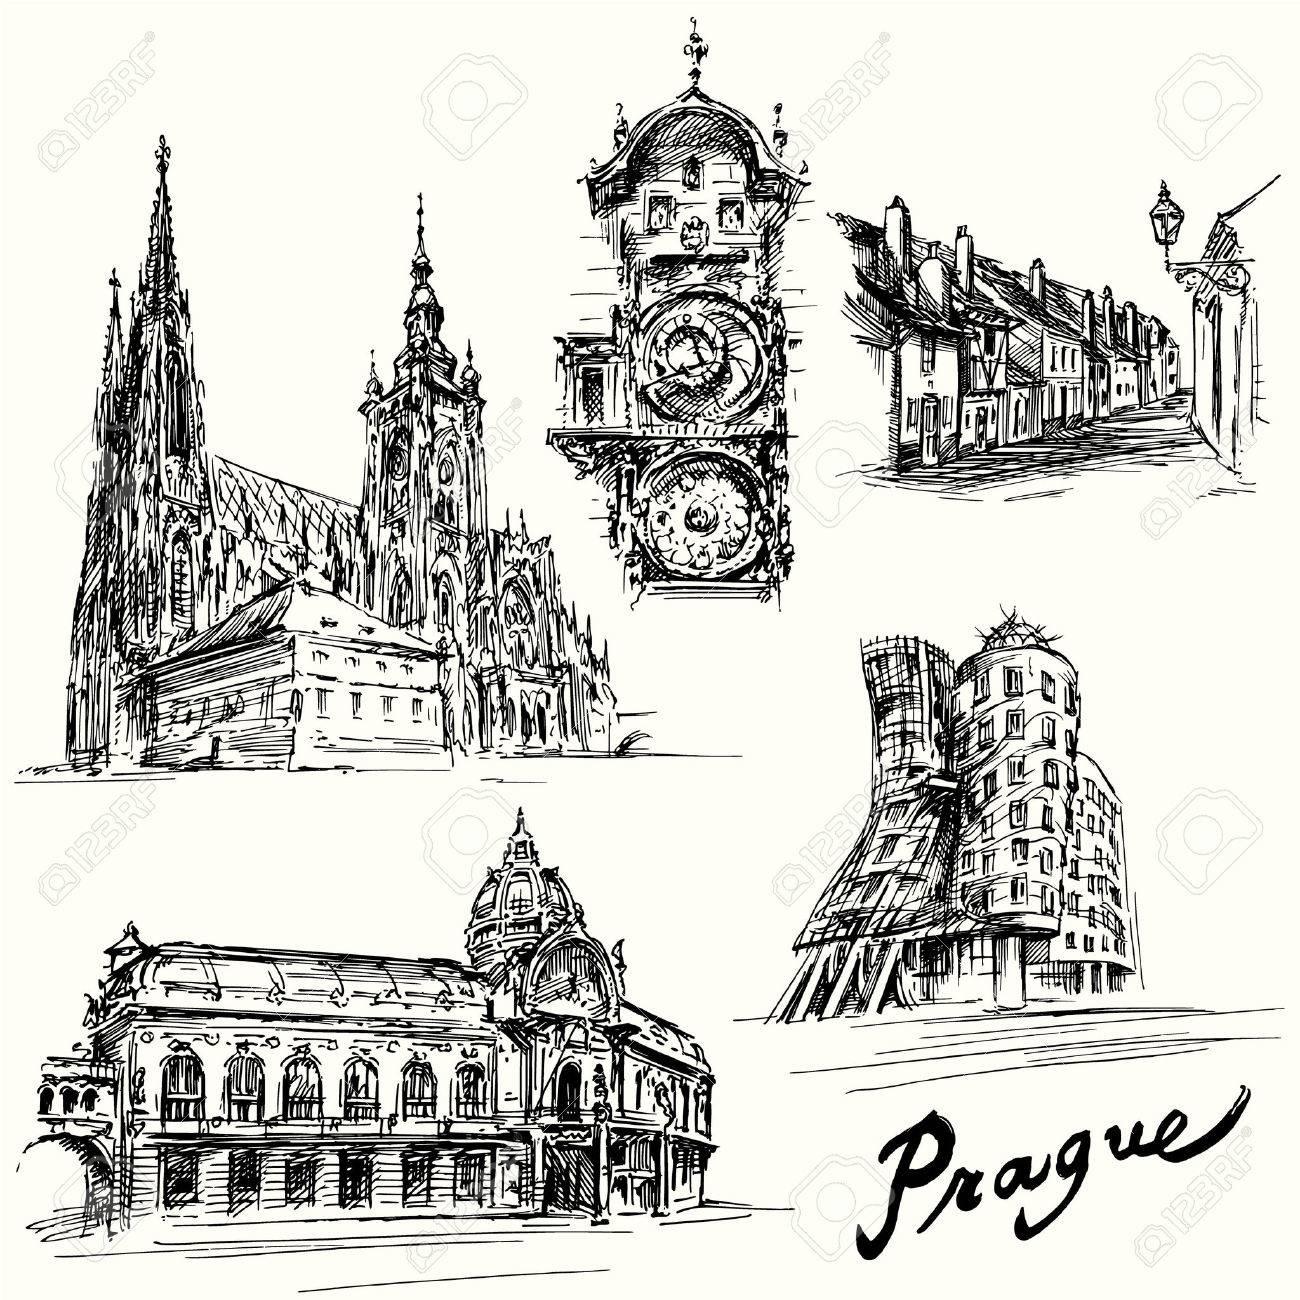 prague - hand drawn illustration Standard-Bild - 31367180